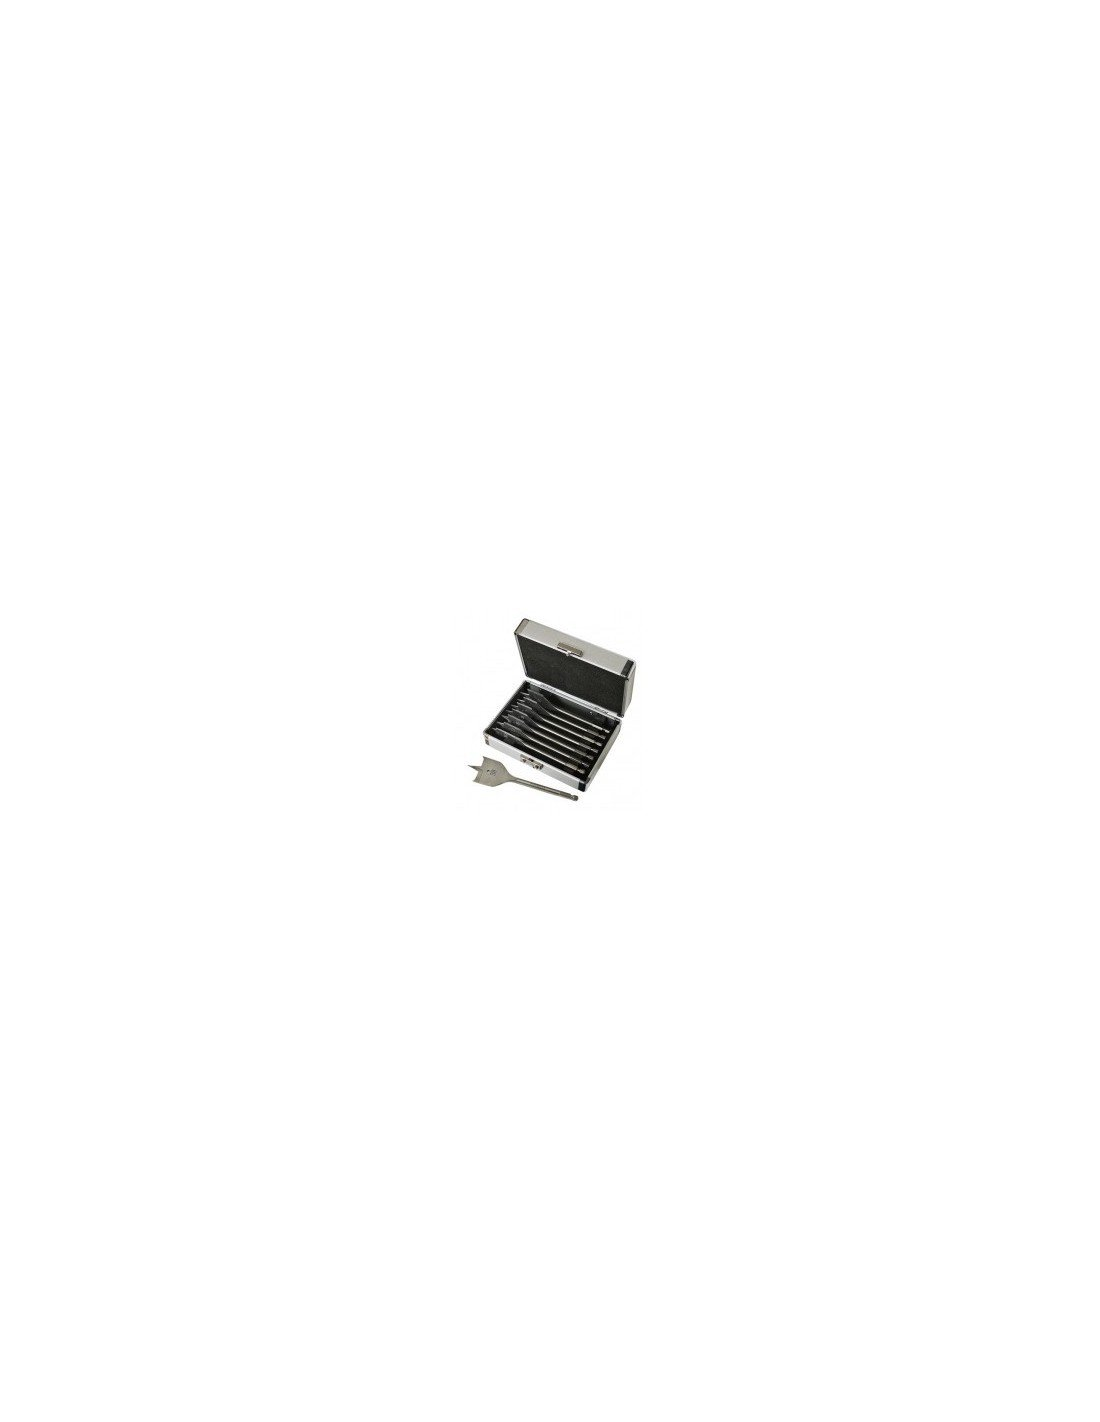 FACOM SC.ASX30x125 Tournevis ProTwist - Empreinte Torx 30x125 mm